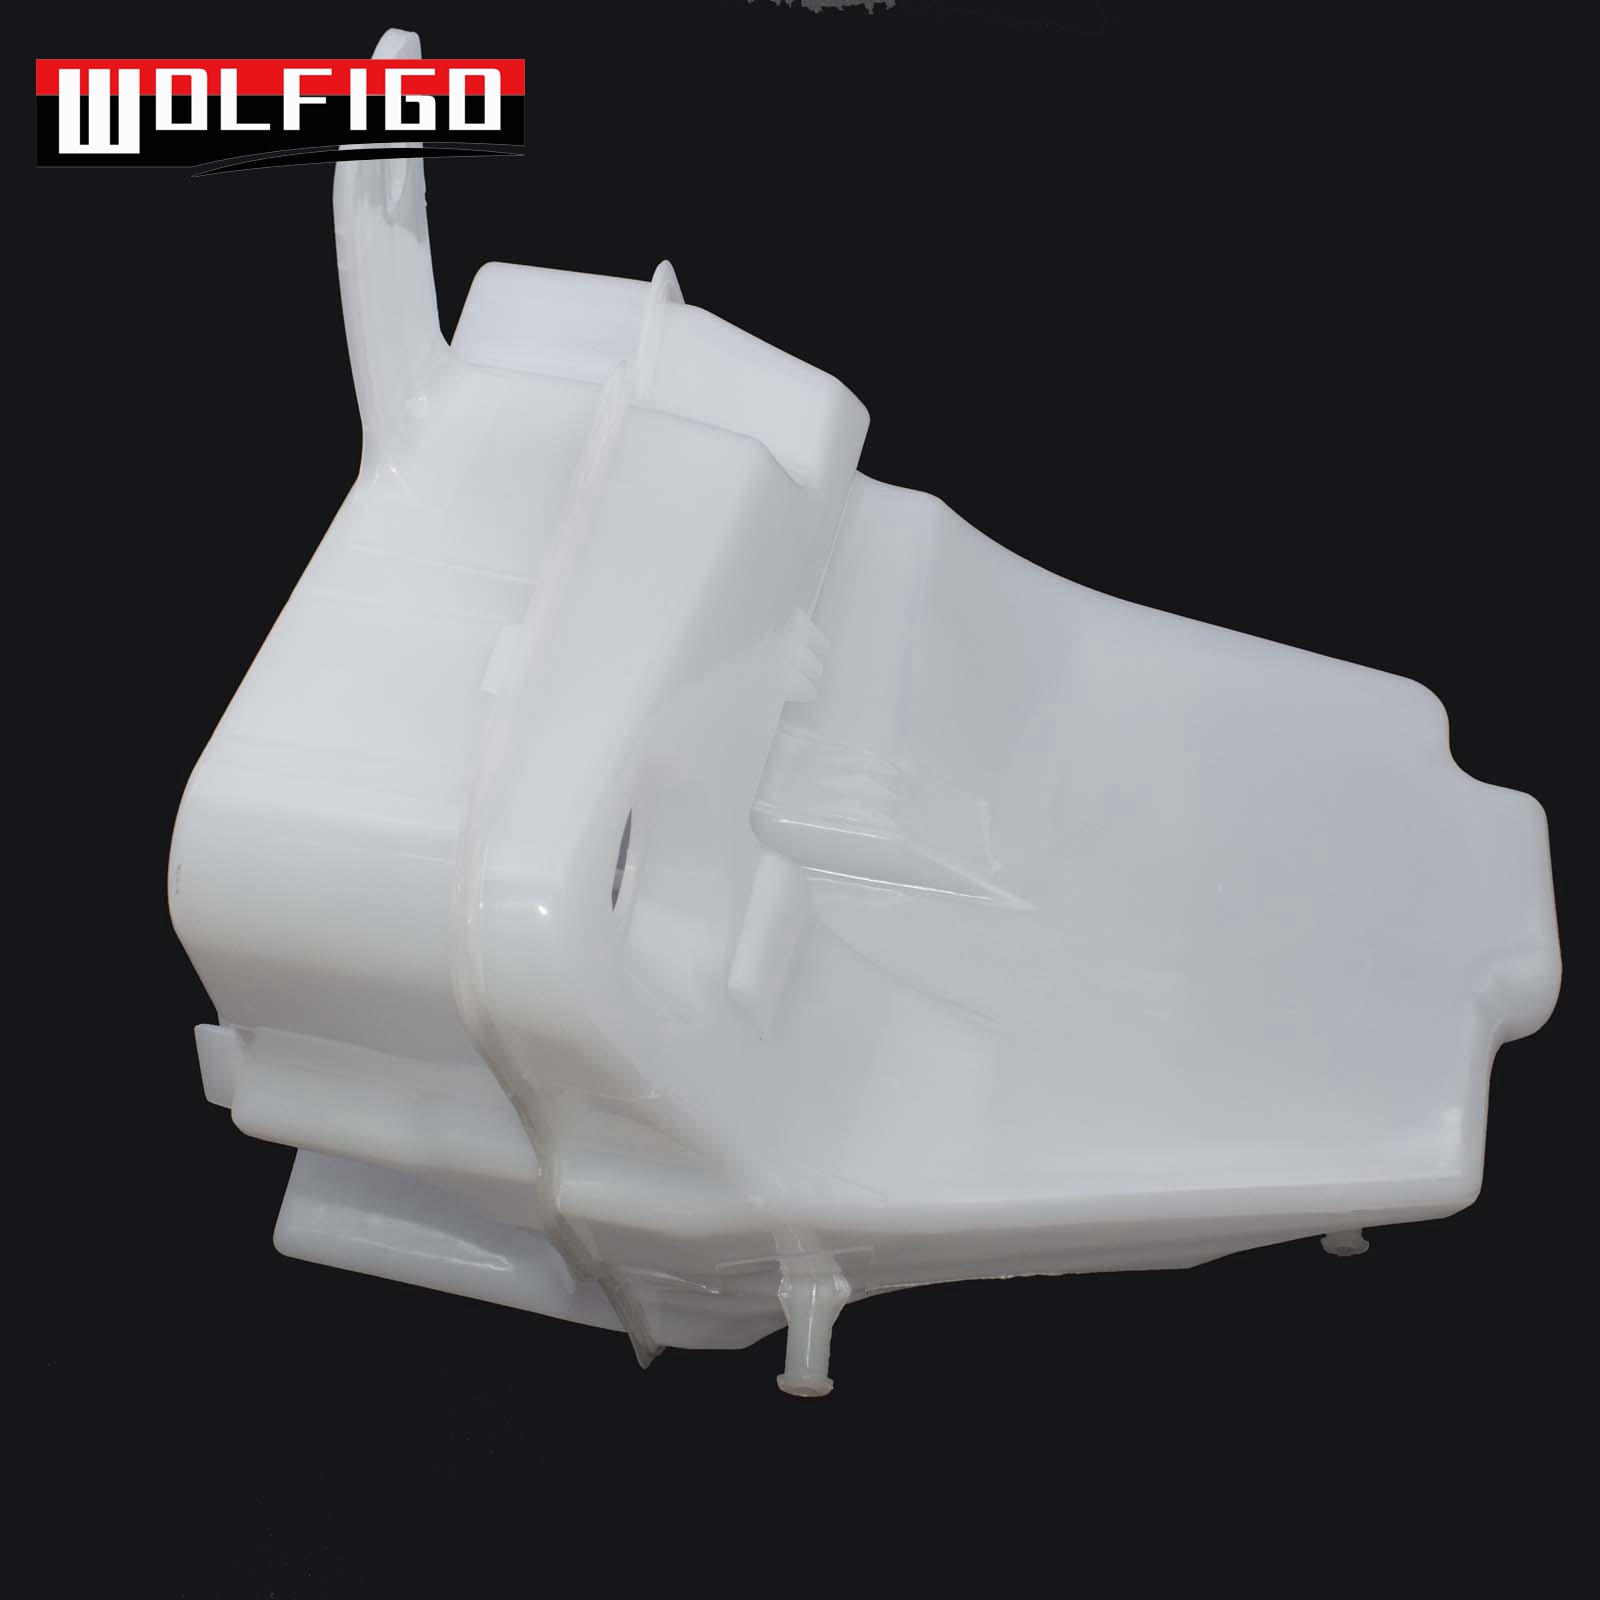 WOLFIGO For Mercedes W163 ML320 ML430 Windshield Washer Fluid Reservoir Tank Container Bottle 1638601160 1638690820 New